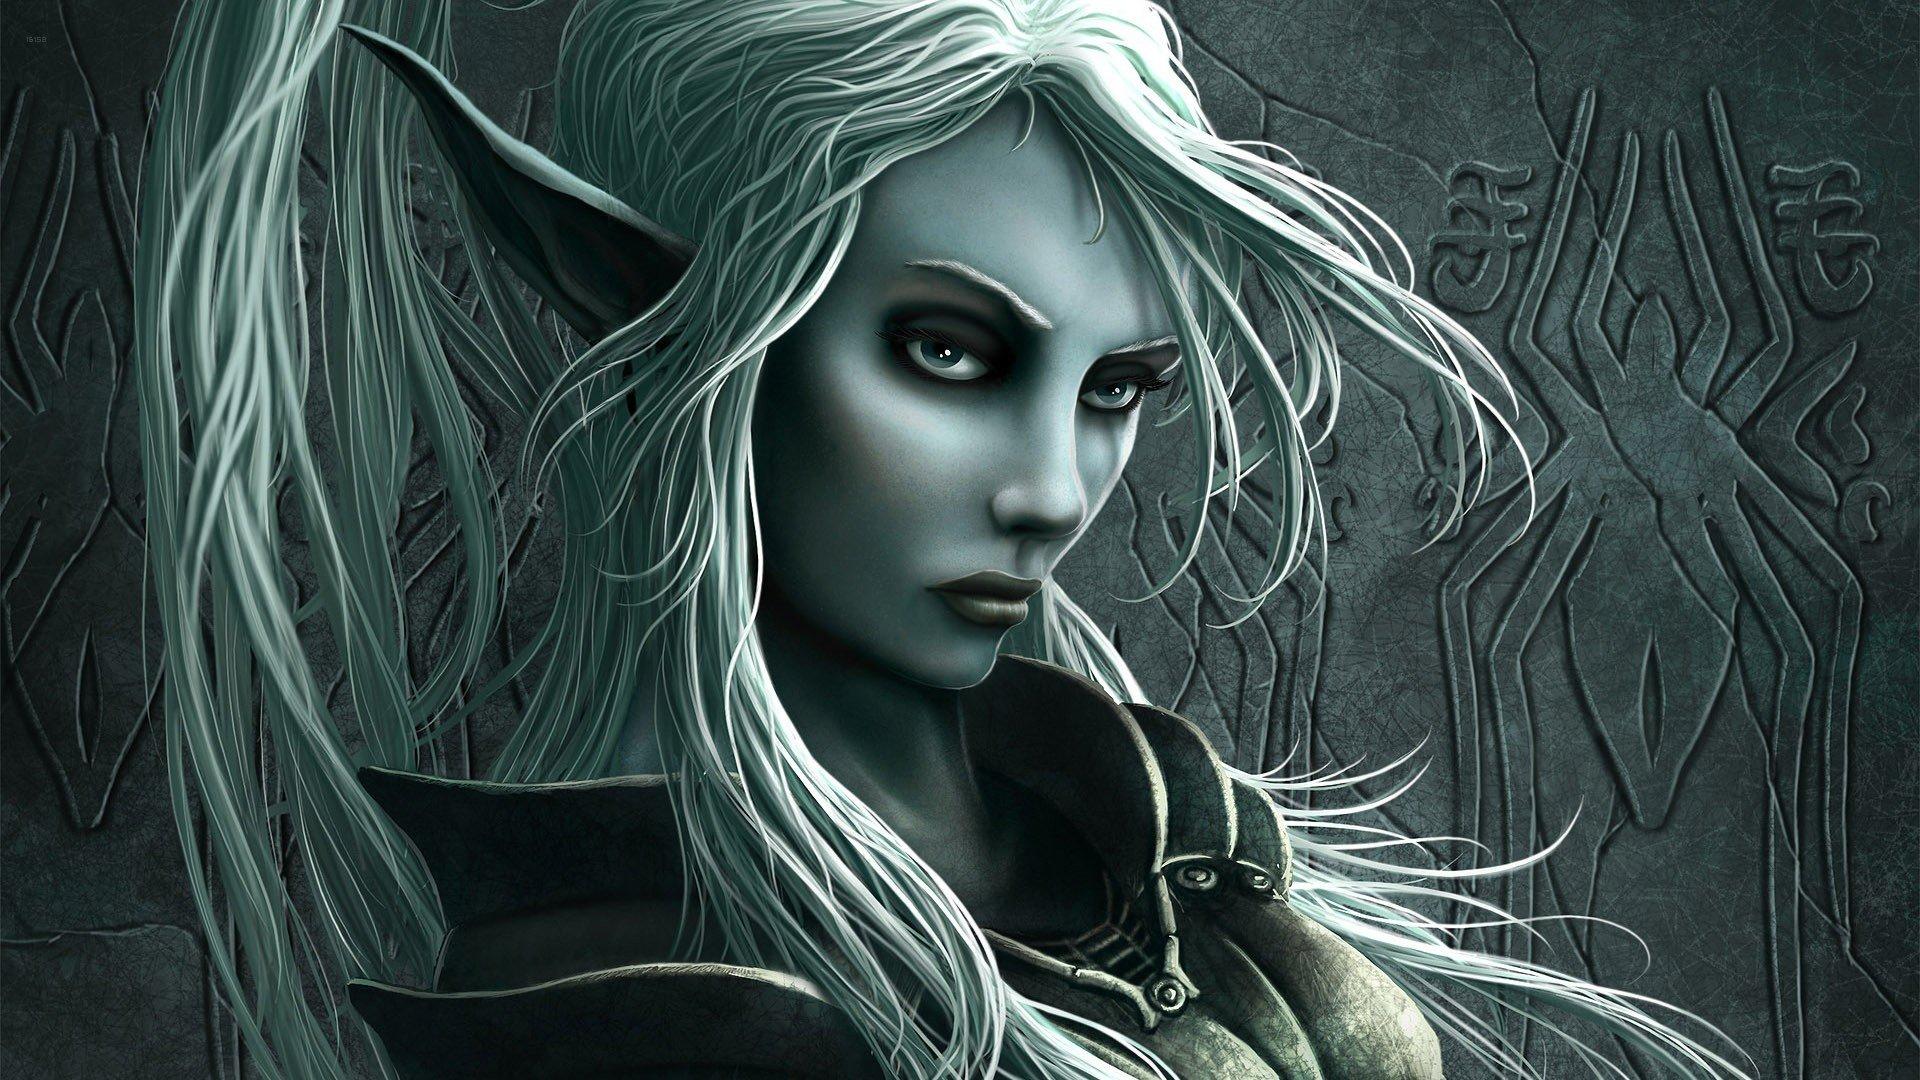 Fantasy Art Elves Wallpapers Hd Desktop And Mobile: Female Drow HD Wallpapers / Desktop And Mobile Images & Photos